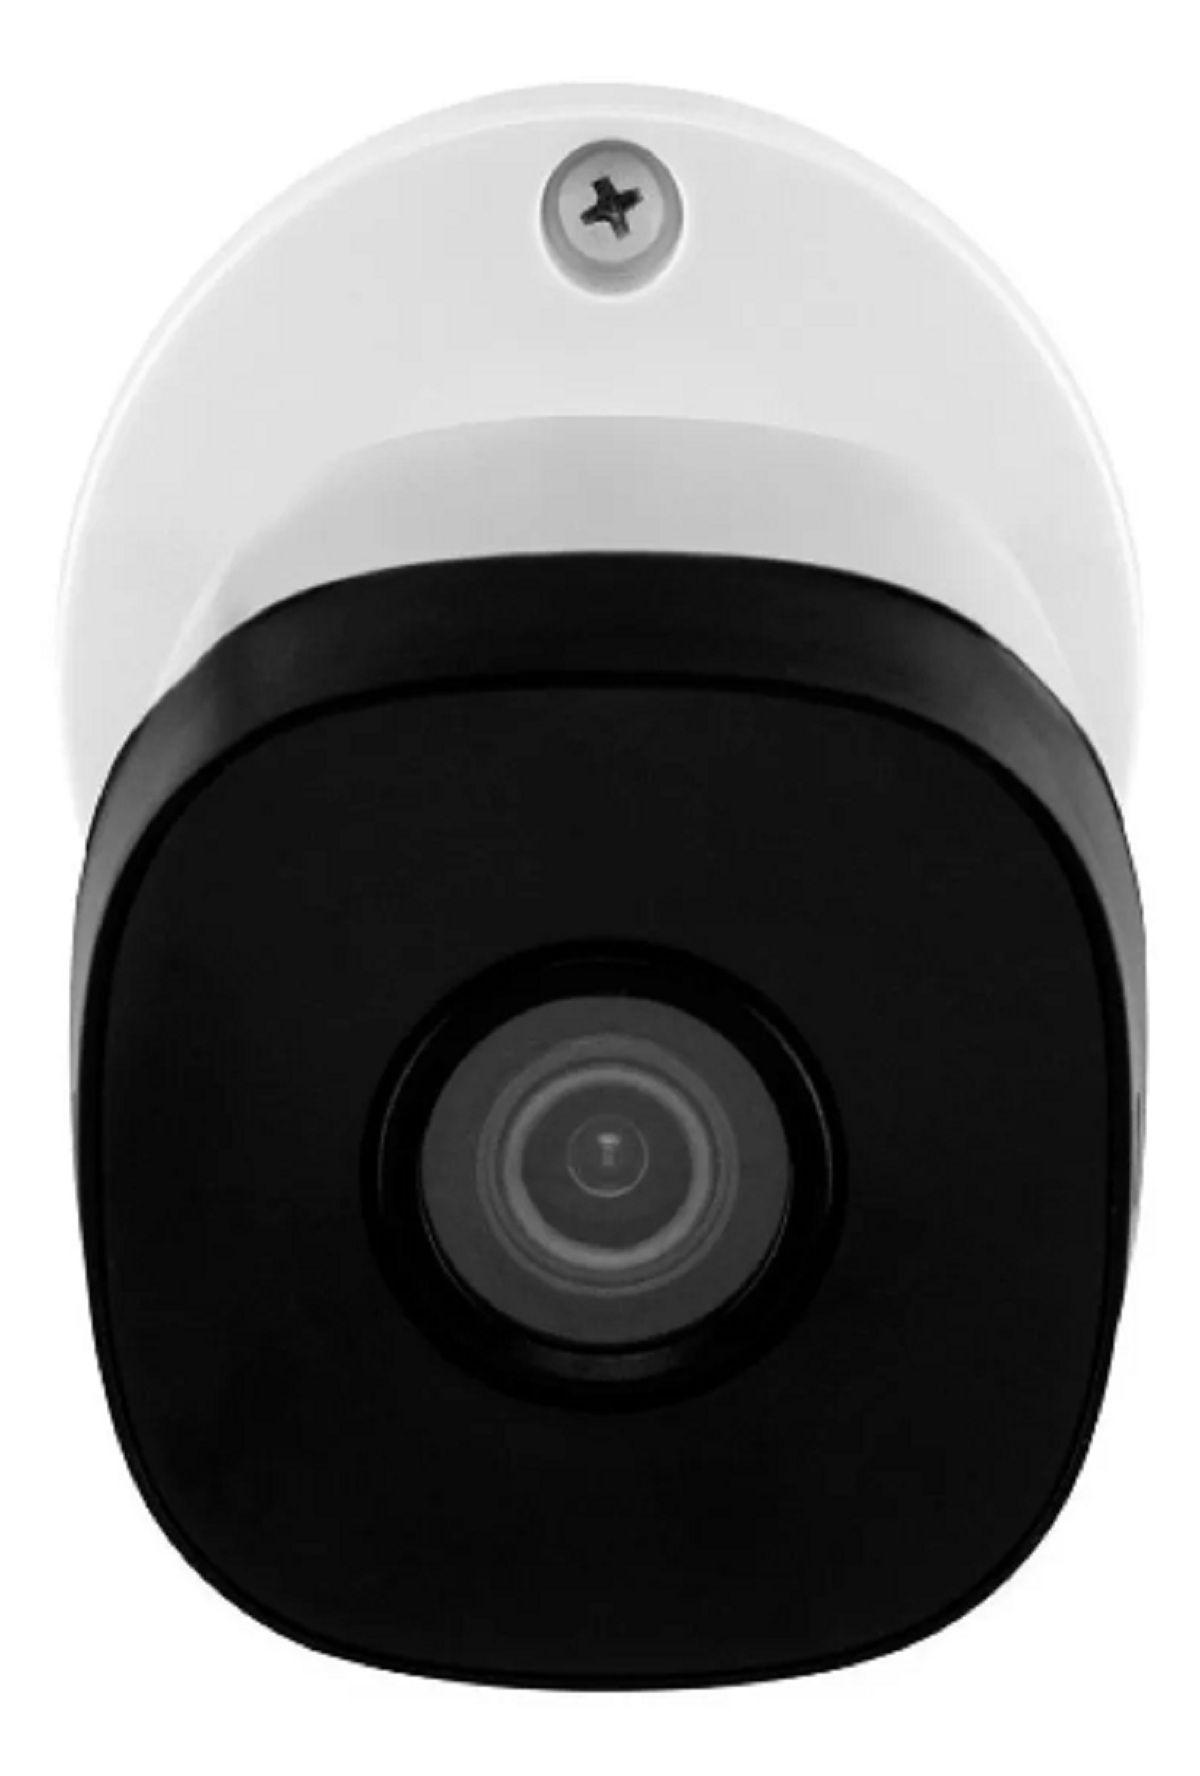 Camera Intelbras Infra Hdcvi 720p Hd Vhd 1120b